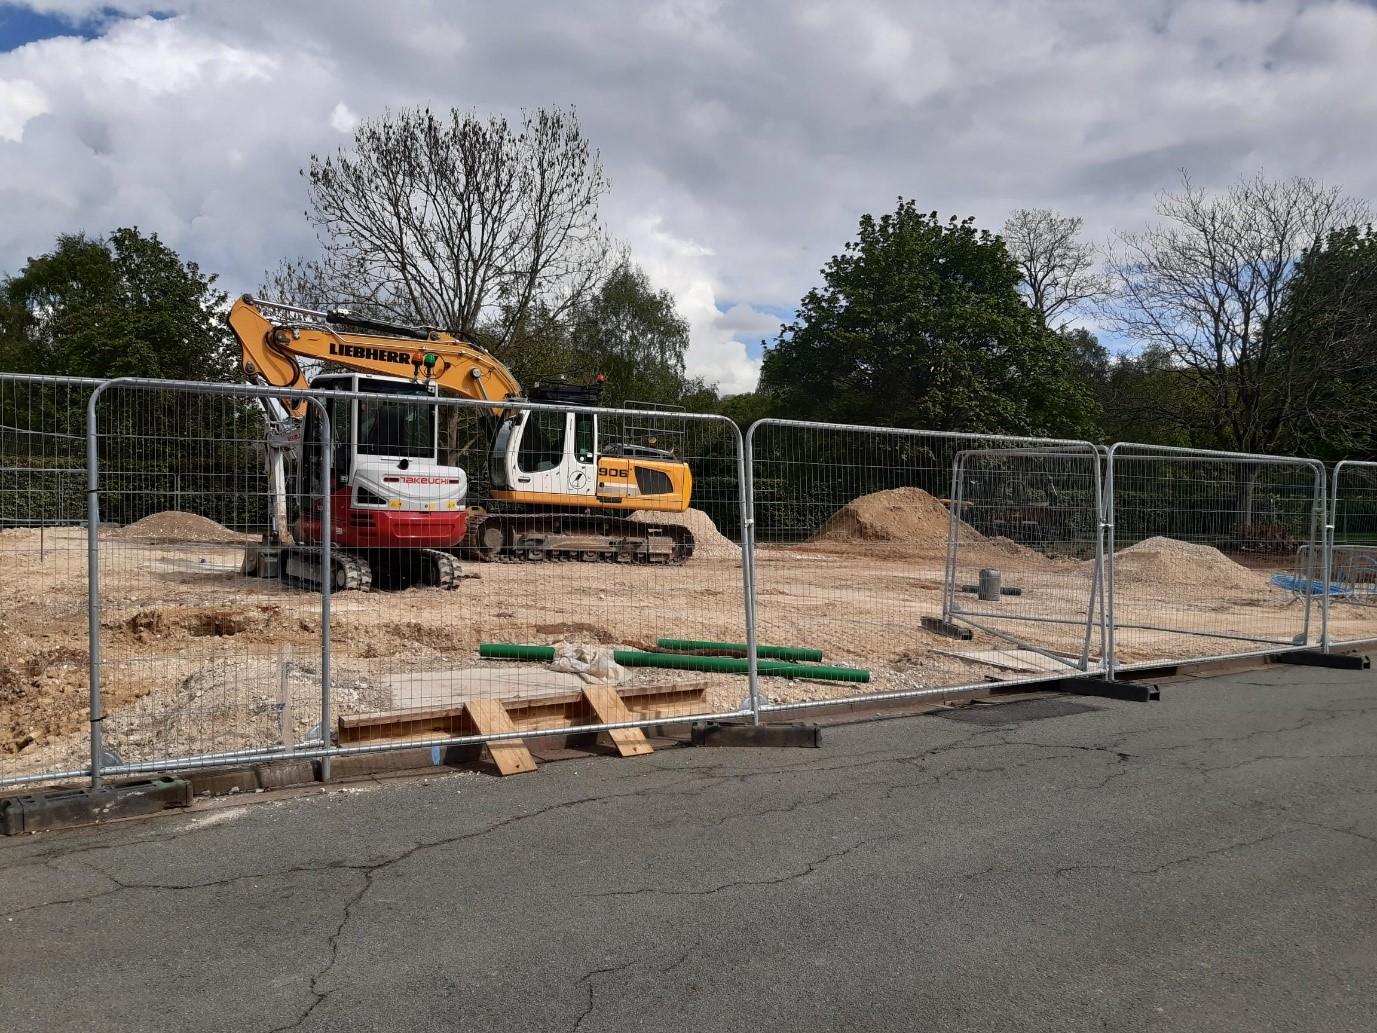 Work continues to improve Lincoln Crematorium facilities